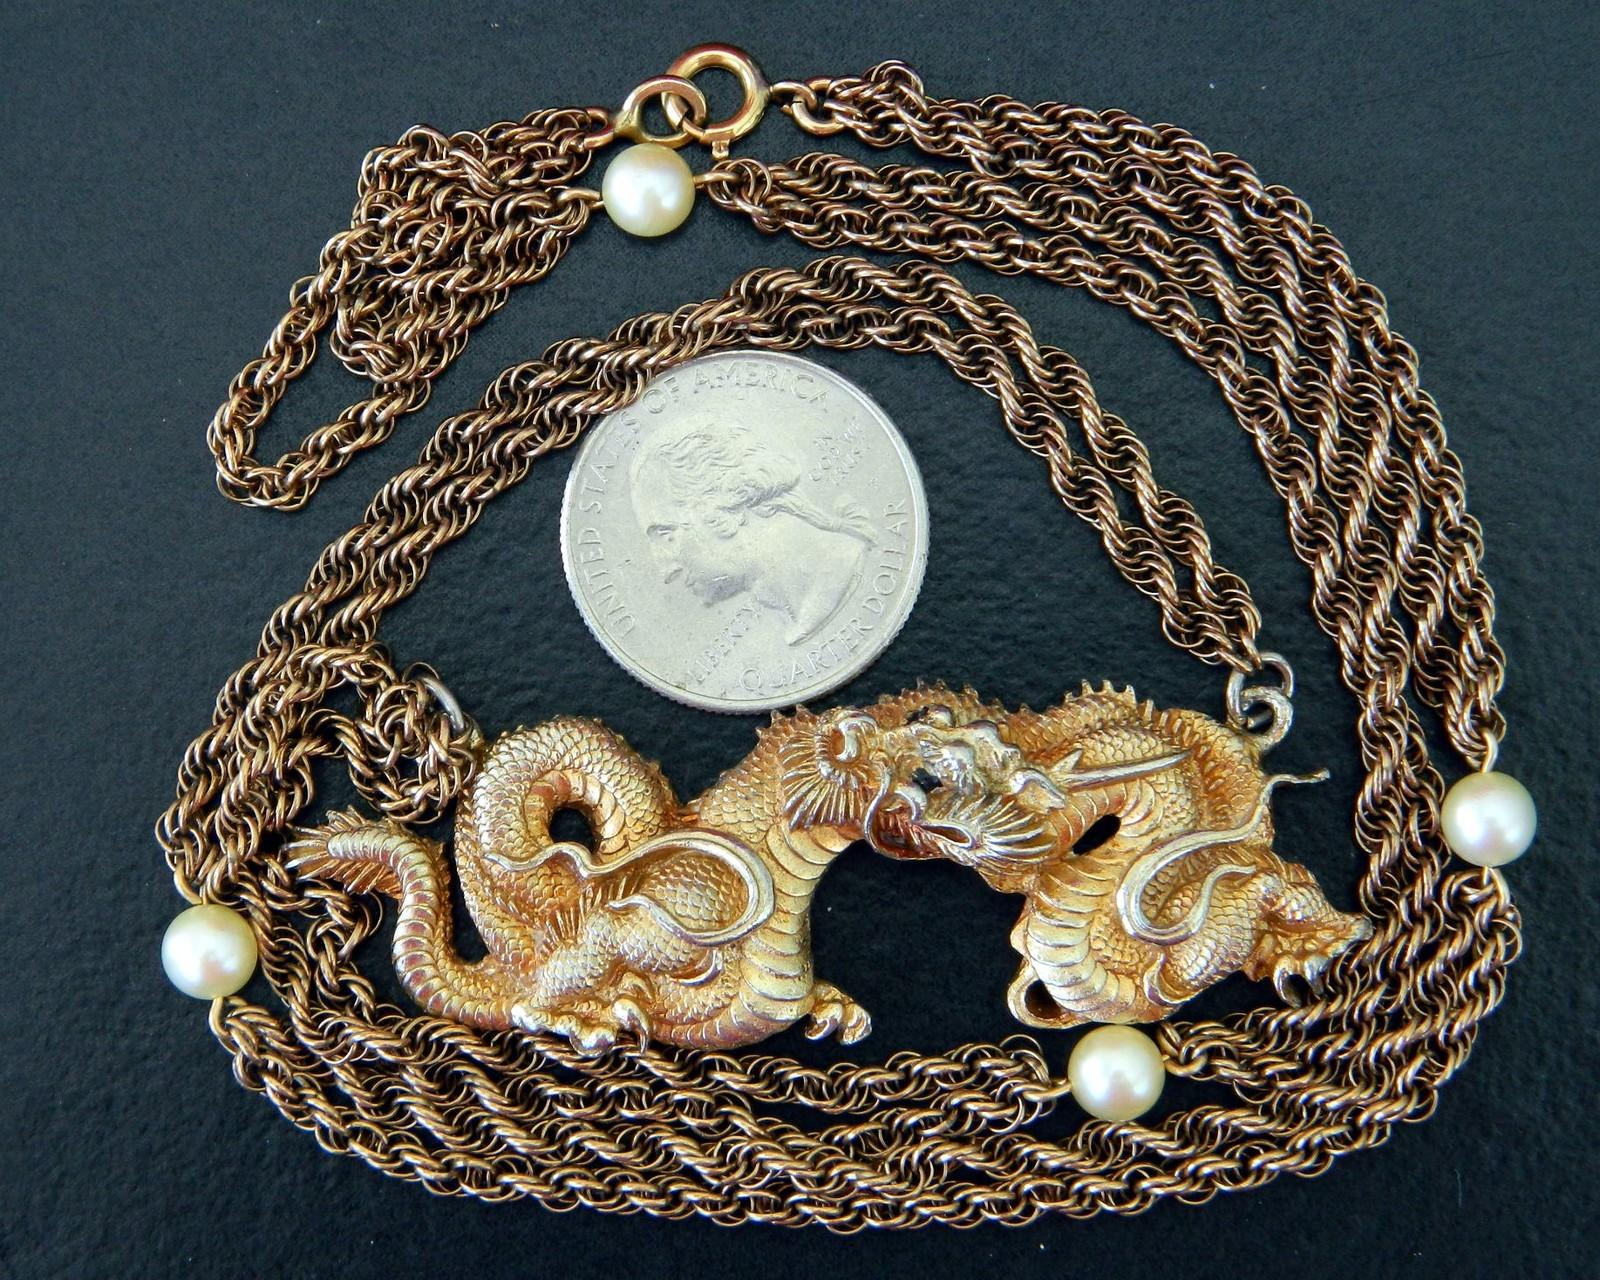 Vintage Alva Museum Replicas Gold Dragon Pendant Pearl Chain Necklace